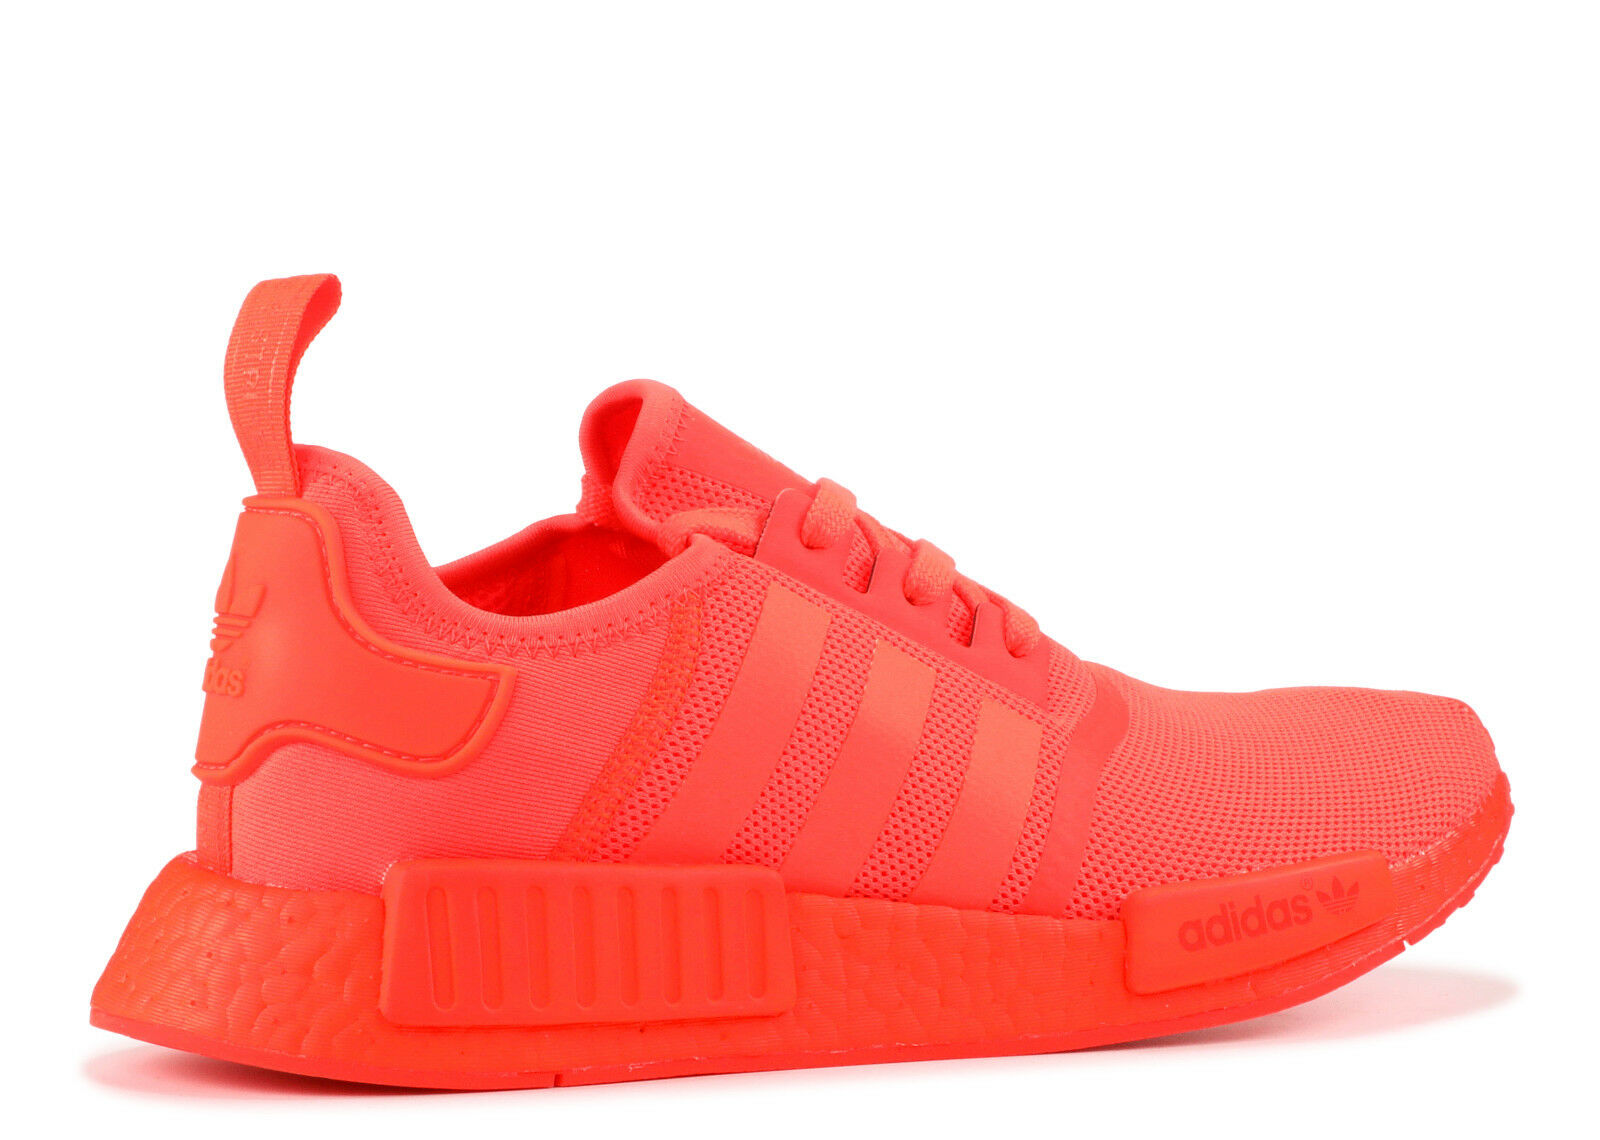 Adidas Nmd les R1 Nomad Triple Solaire Rouge Hommes'D Baskets Toutes les Nmd Tailles ( 622be5